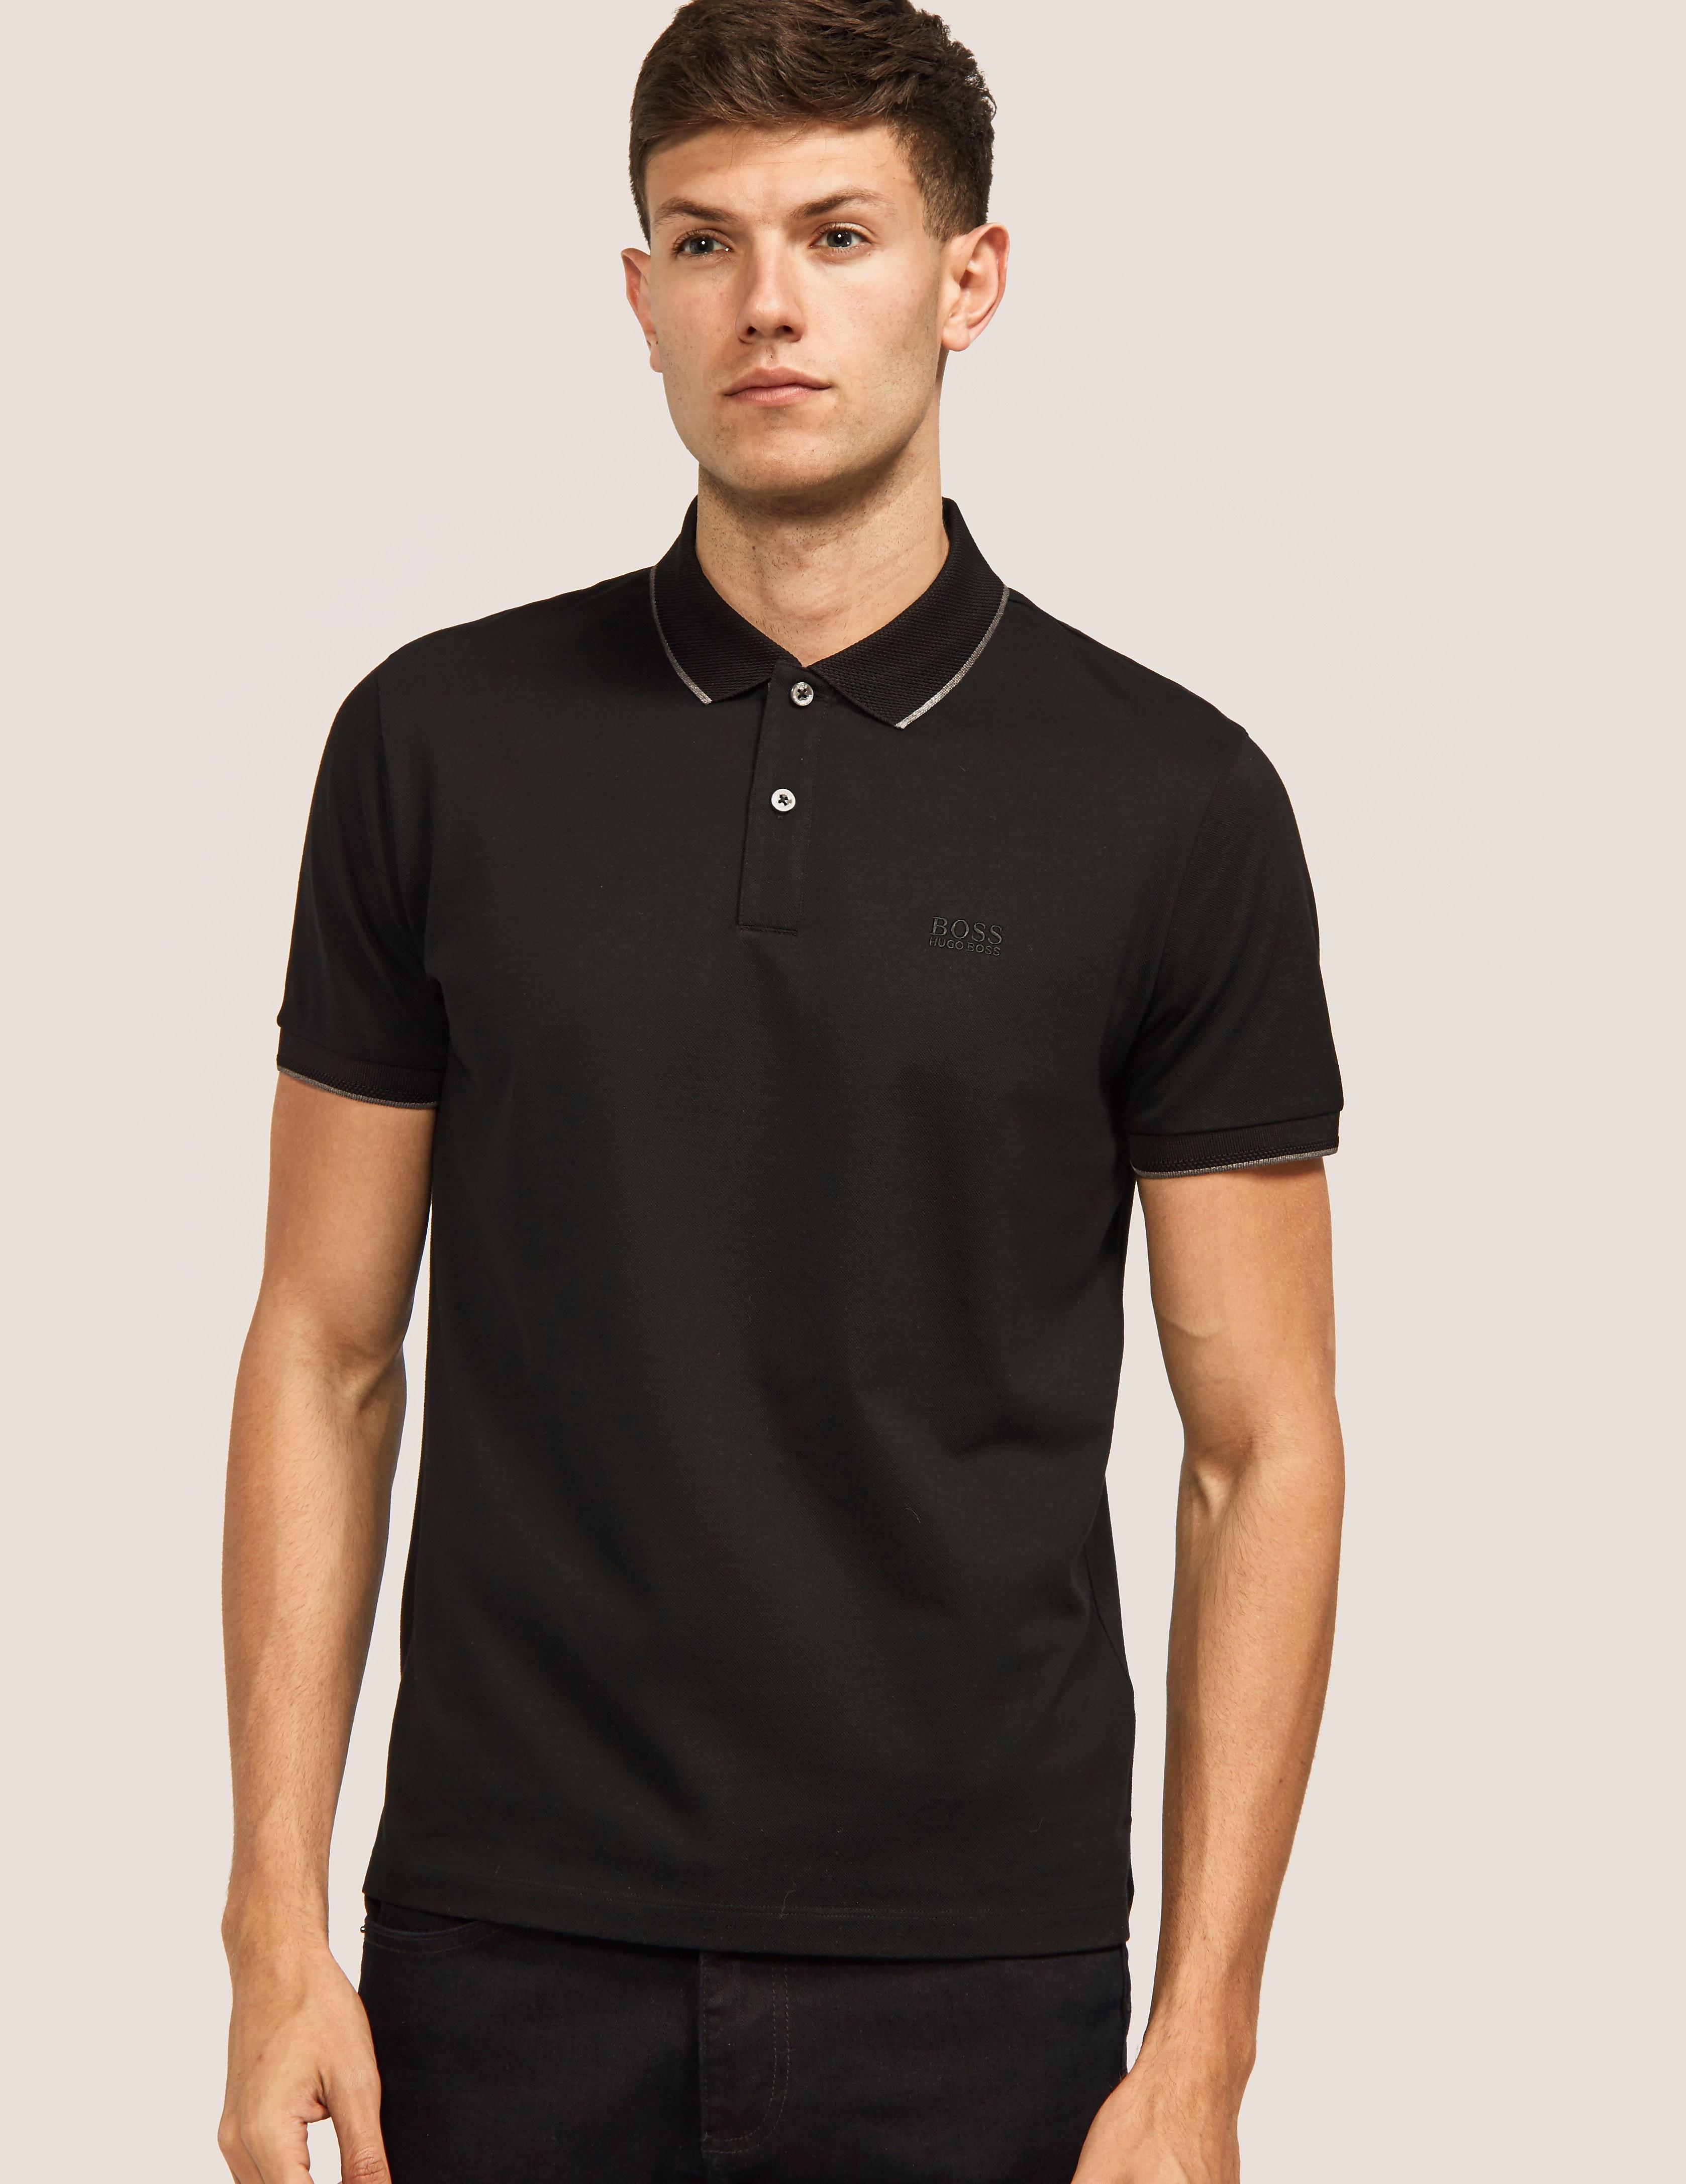 BOSS Parlay03 Trim Polo Shirt